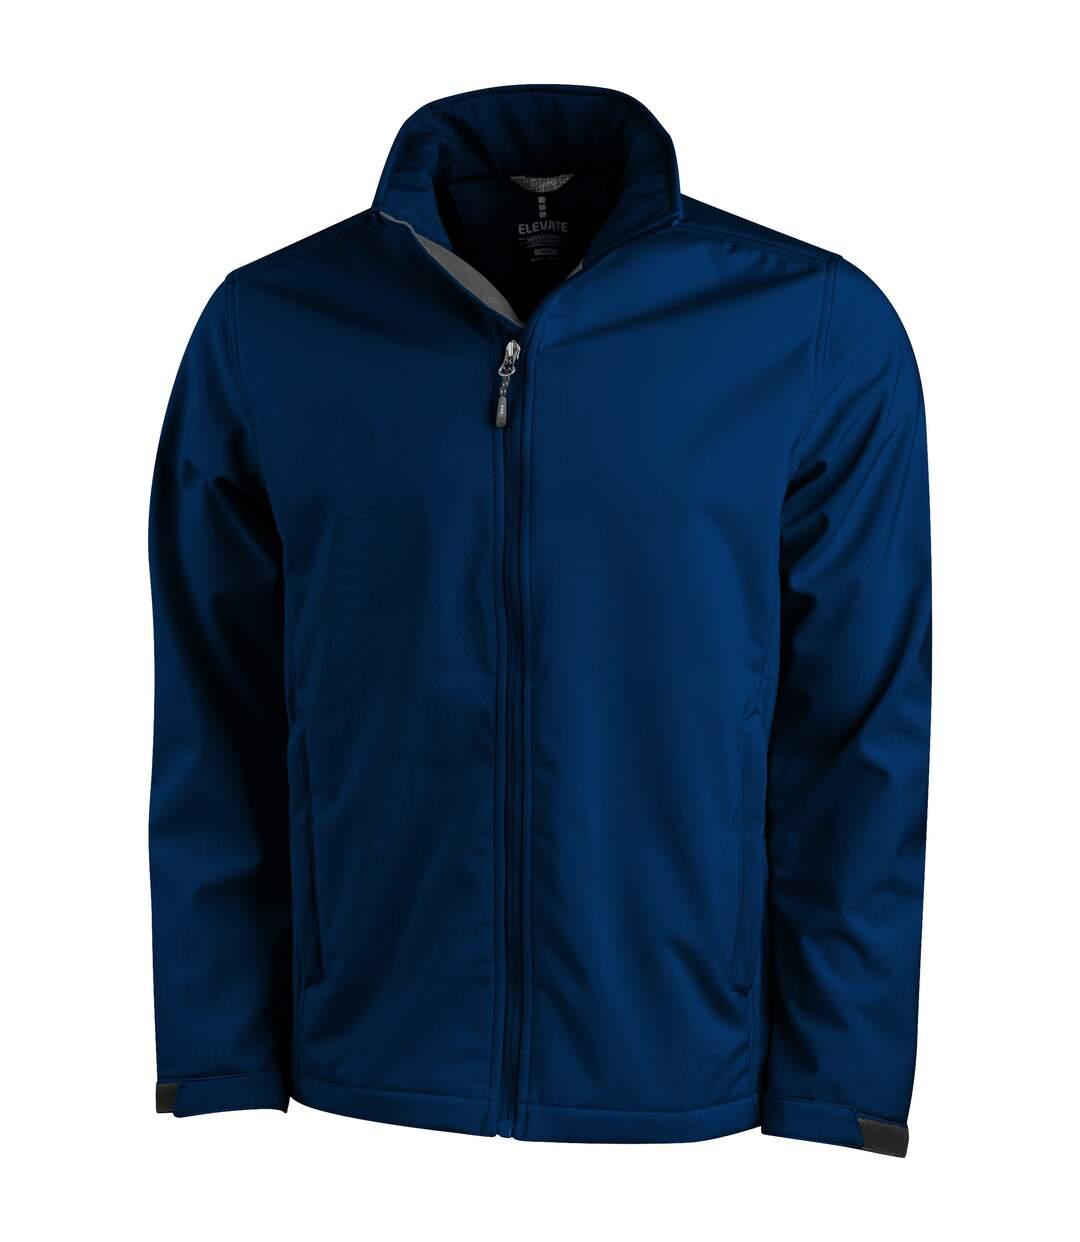 Elevate Mens Maxson Softshell Jacket (Fern Green) - UTPF1866